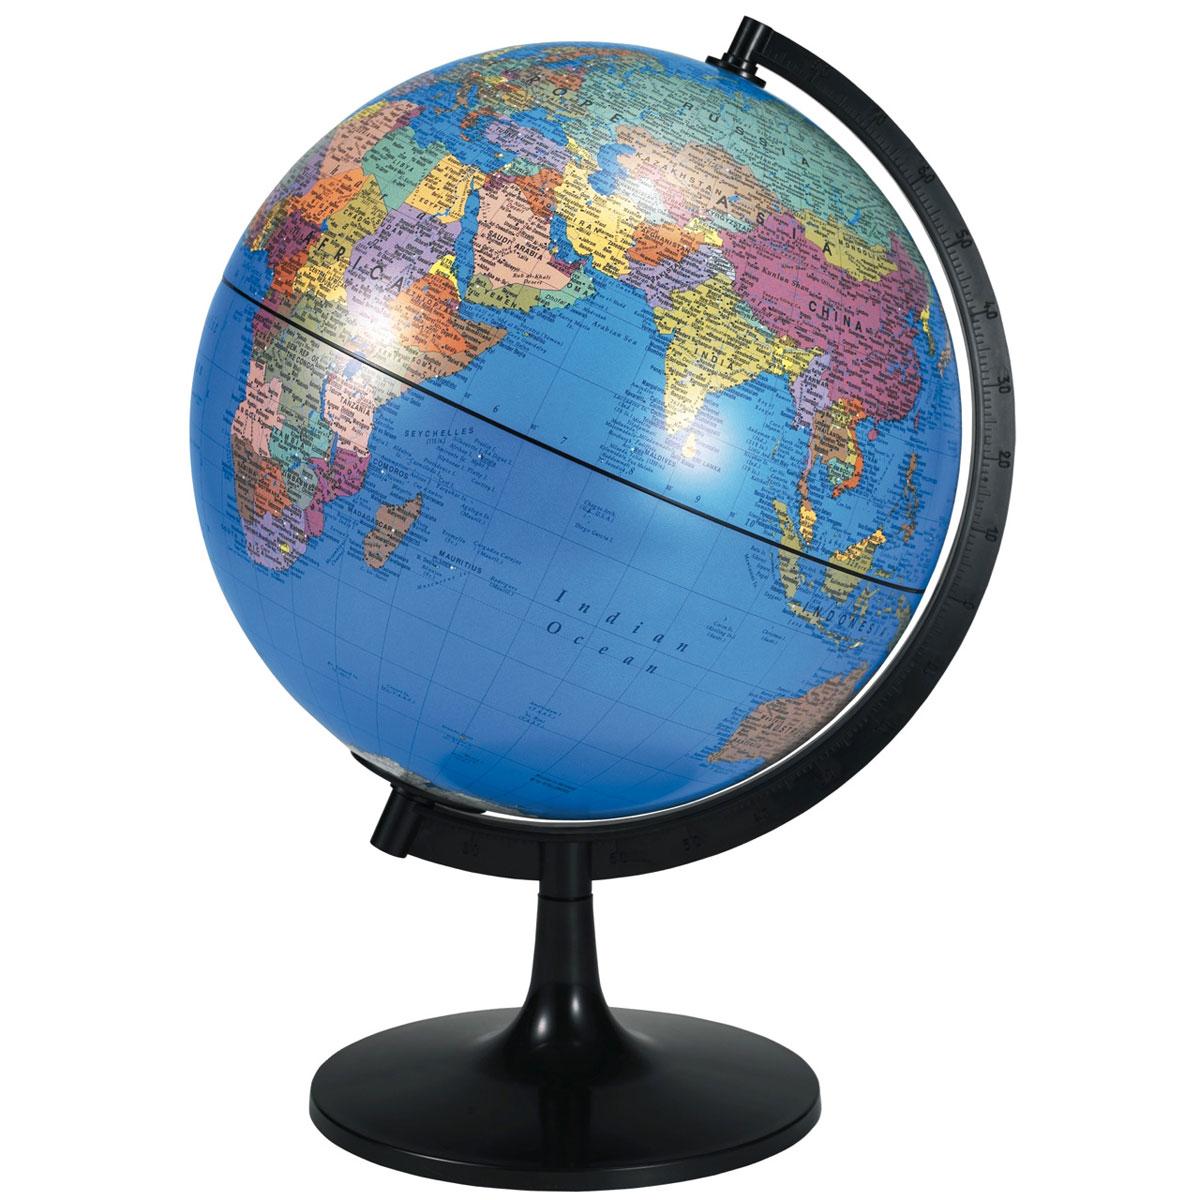 World: Buy Political World Globe - 280mm CD57007